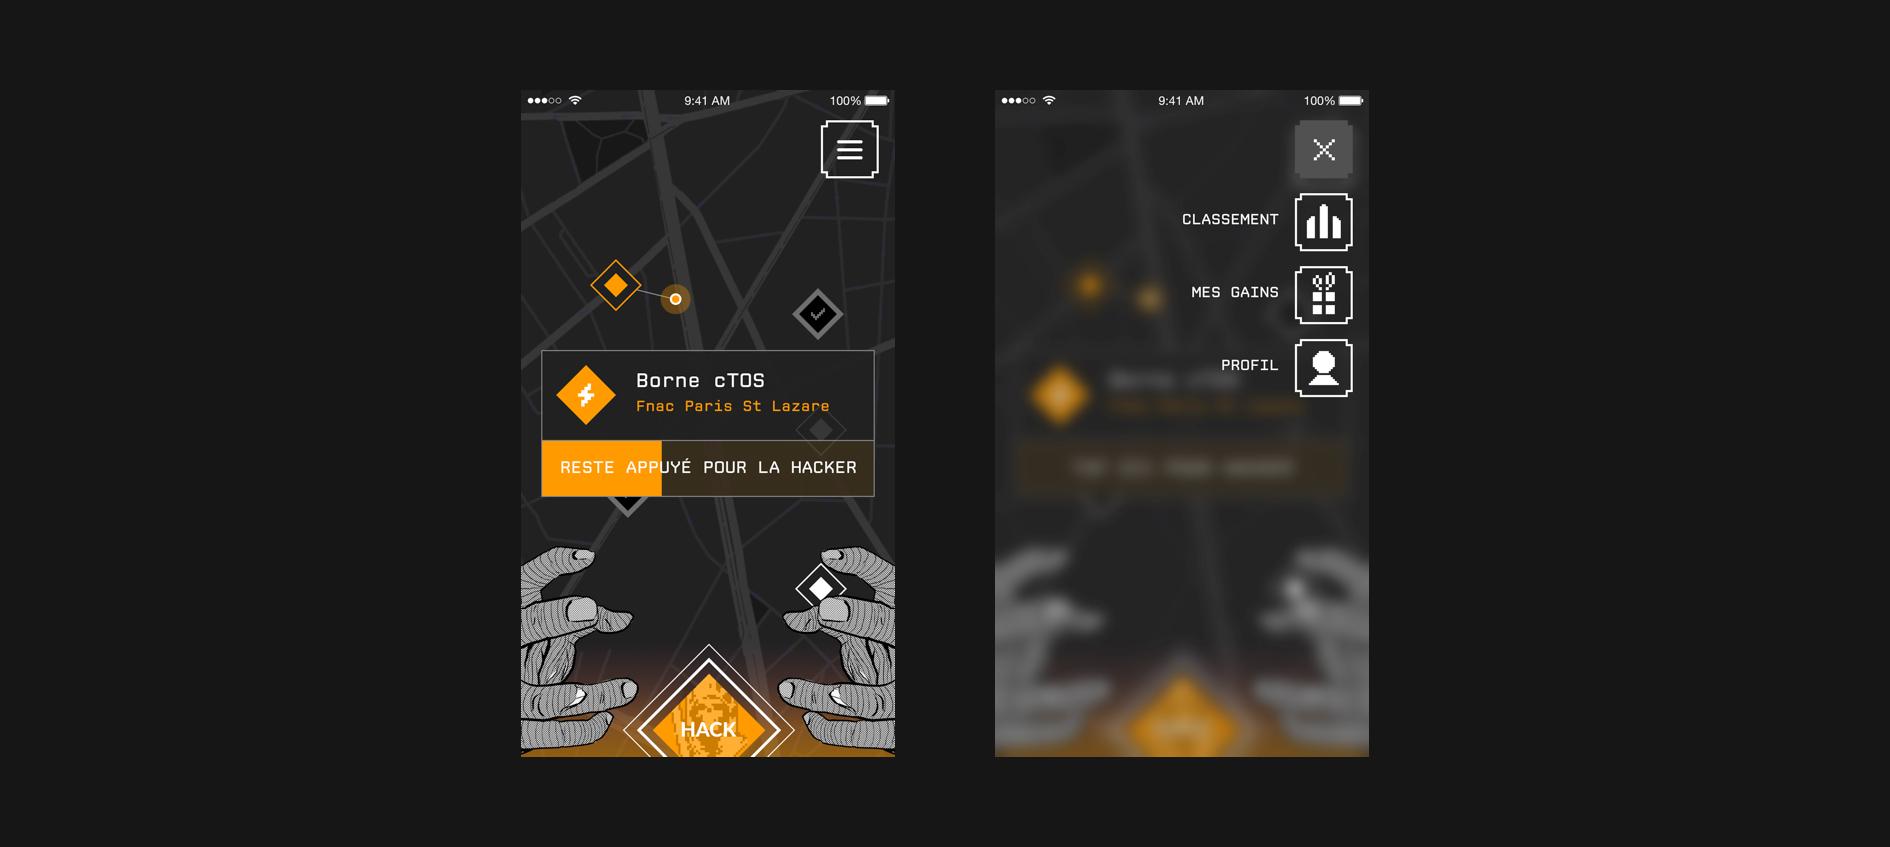 new-planche-app-11